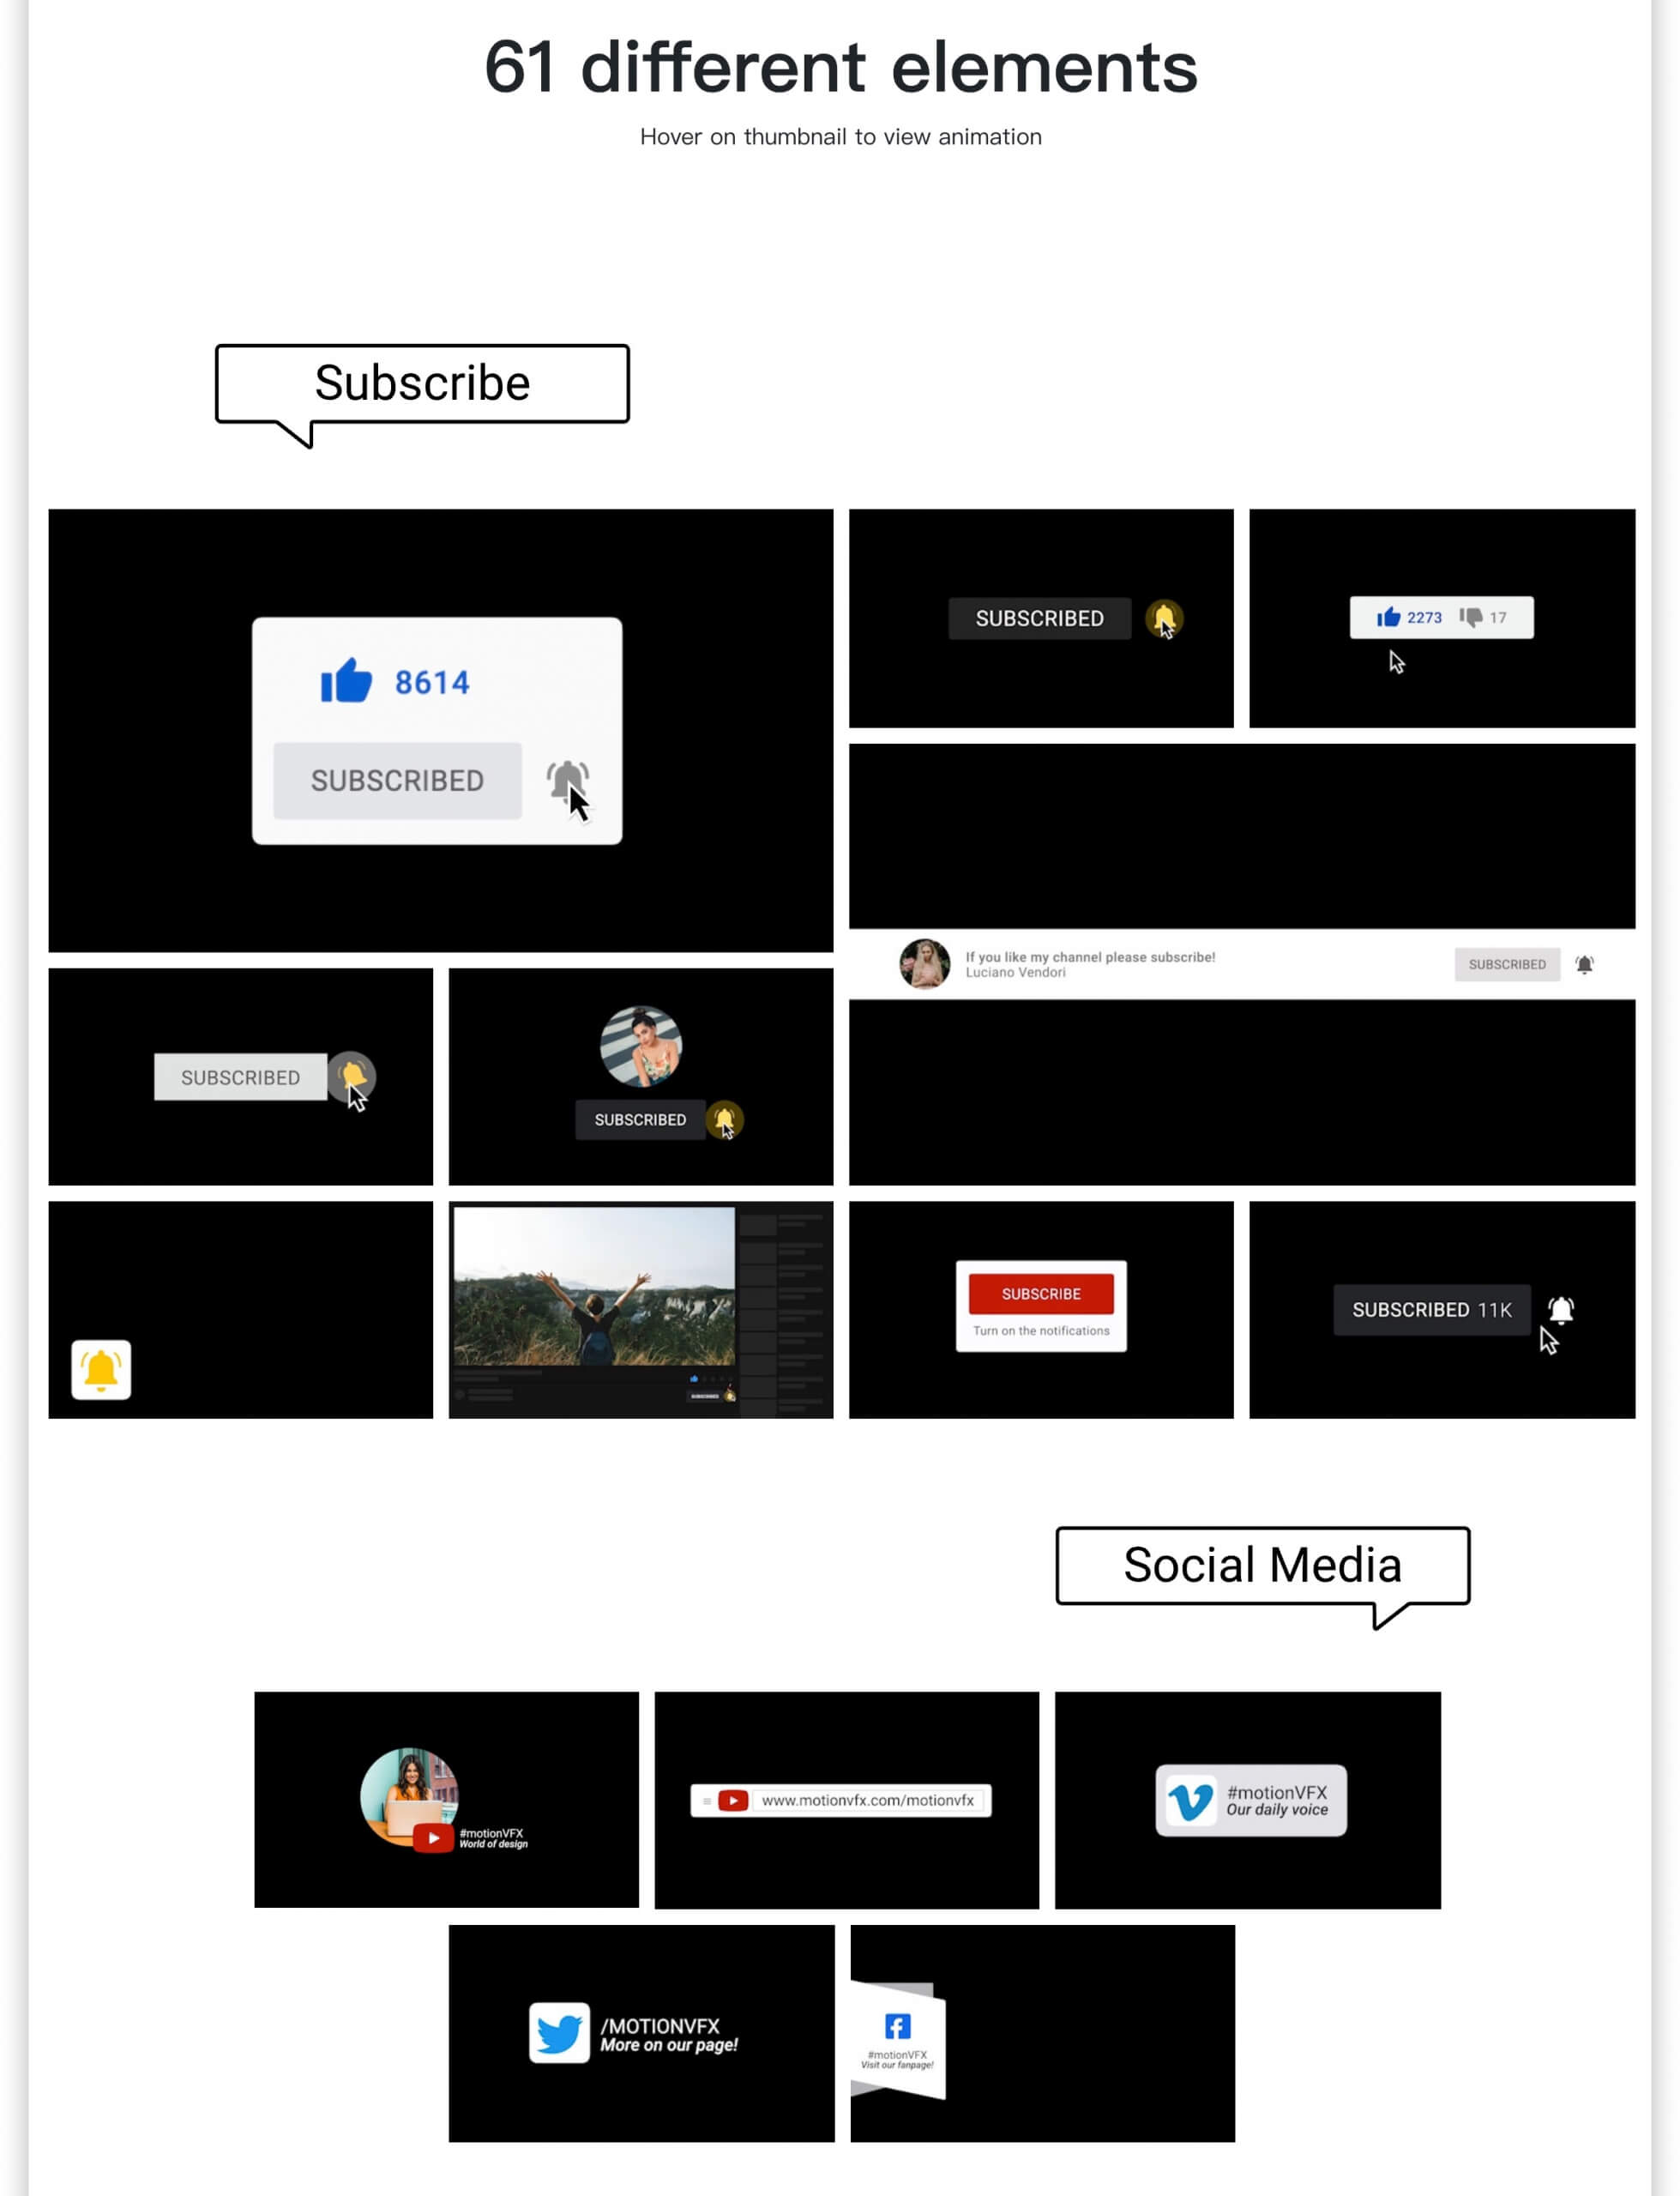 fcpx插件 视频博主影片制作工具包 LOGO展示下节预告点赞背景等 支持M1 mTuber 2